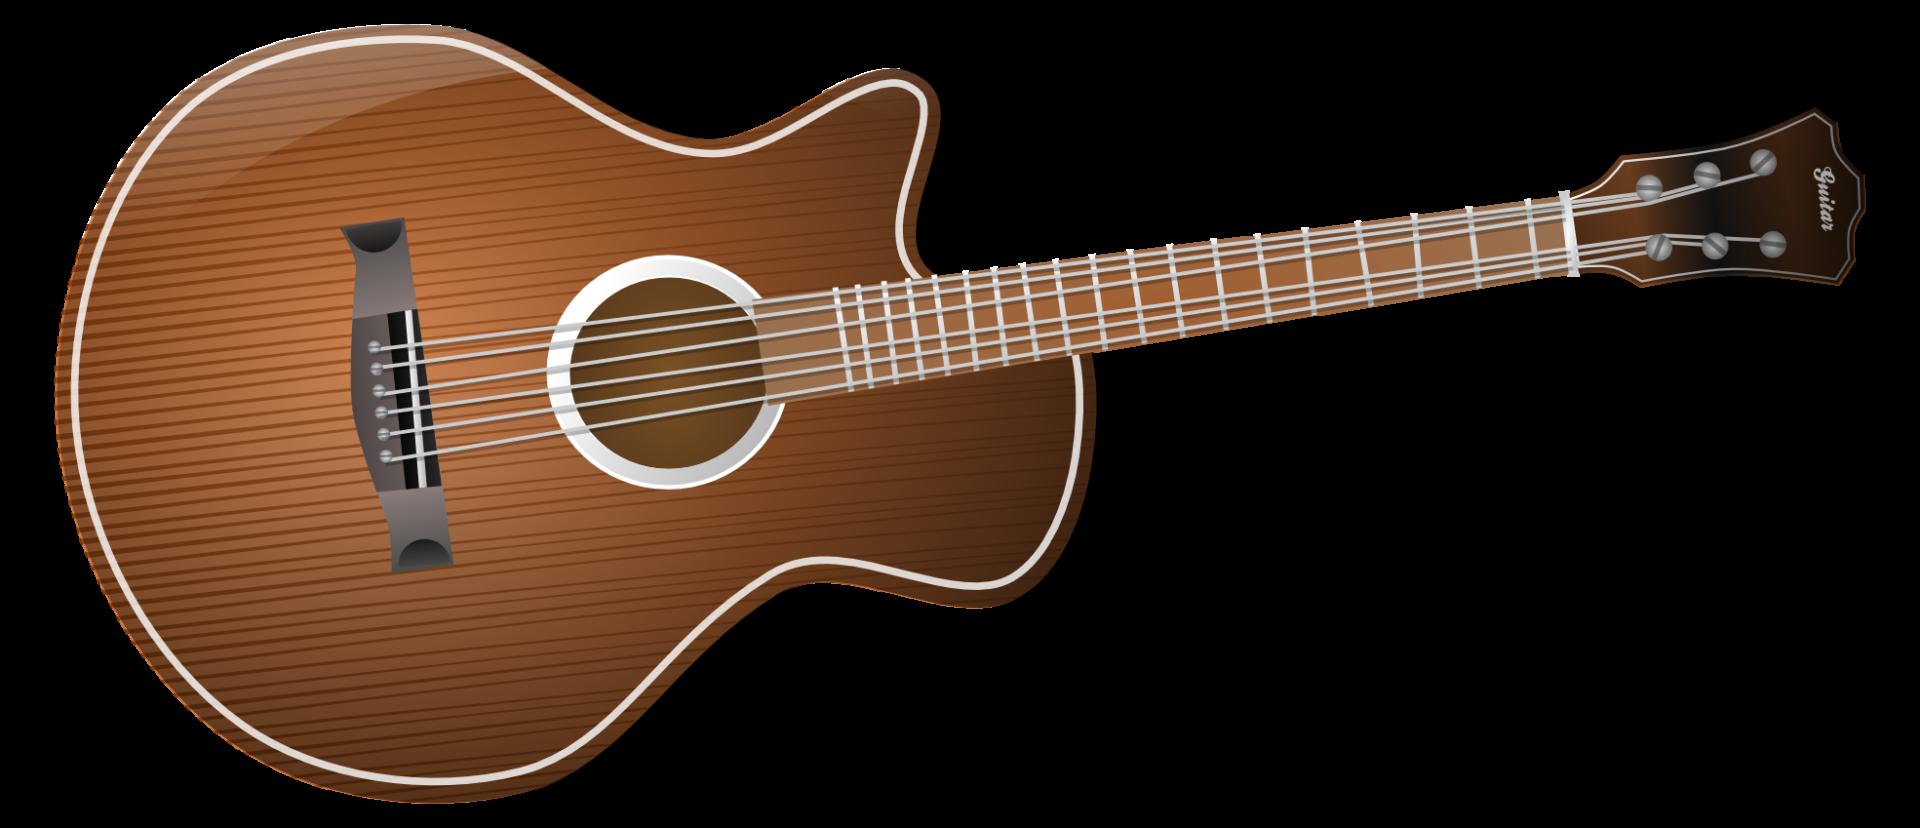 Reprise de l'atelier guitare